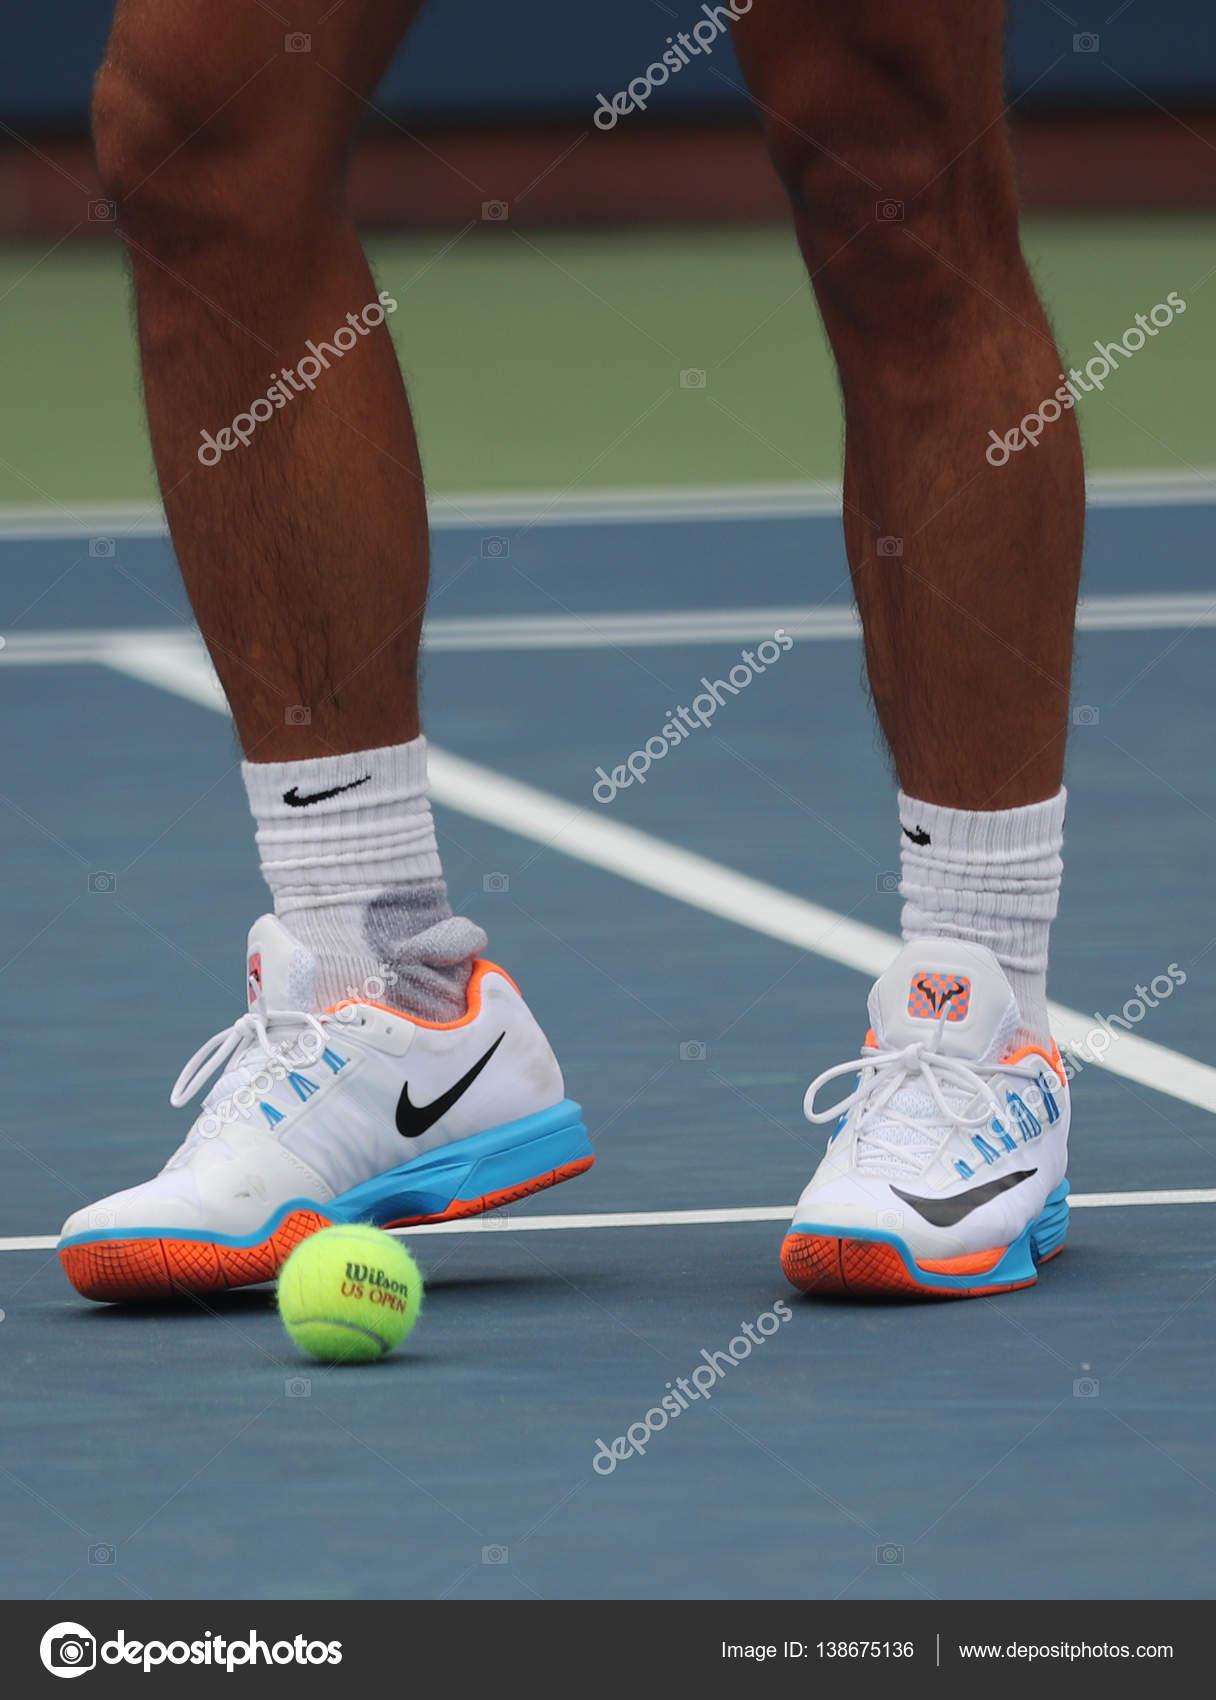 scarpe da tennis rafael nadal